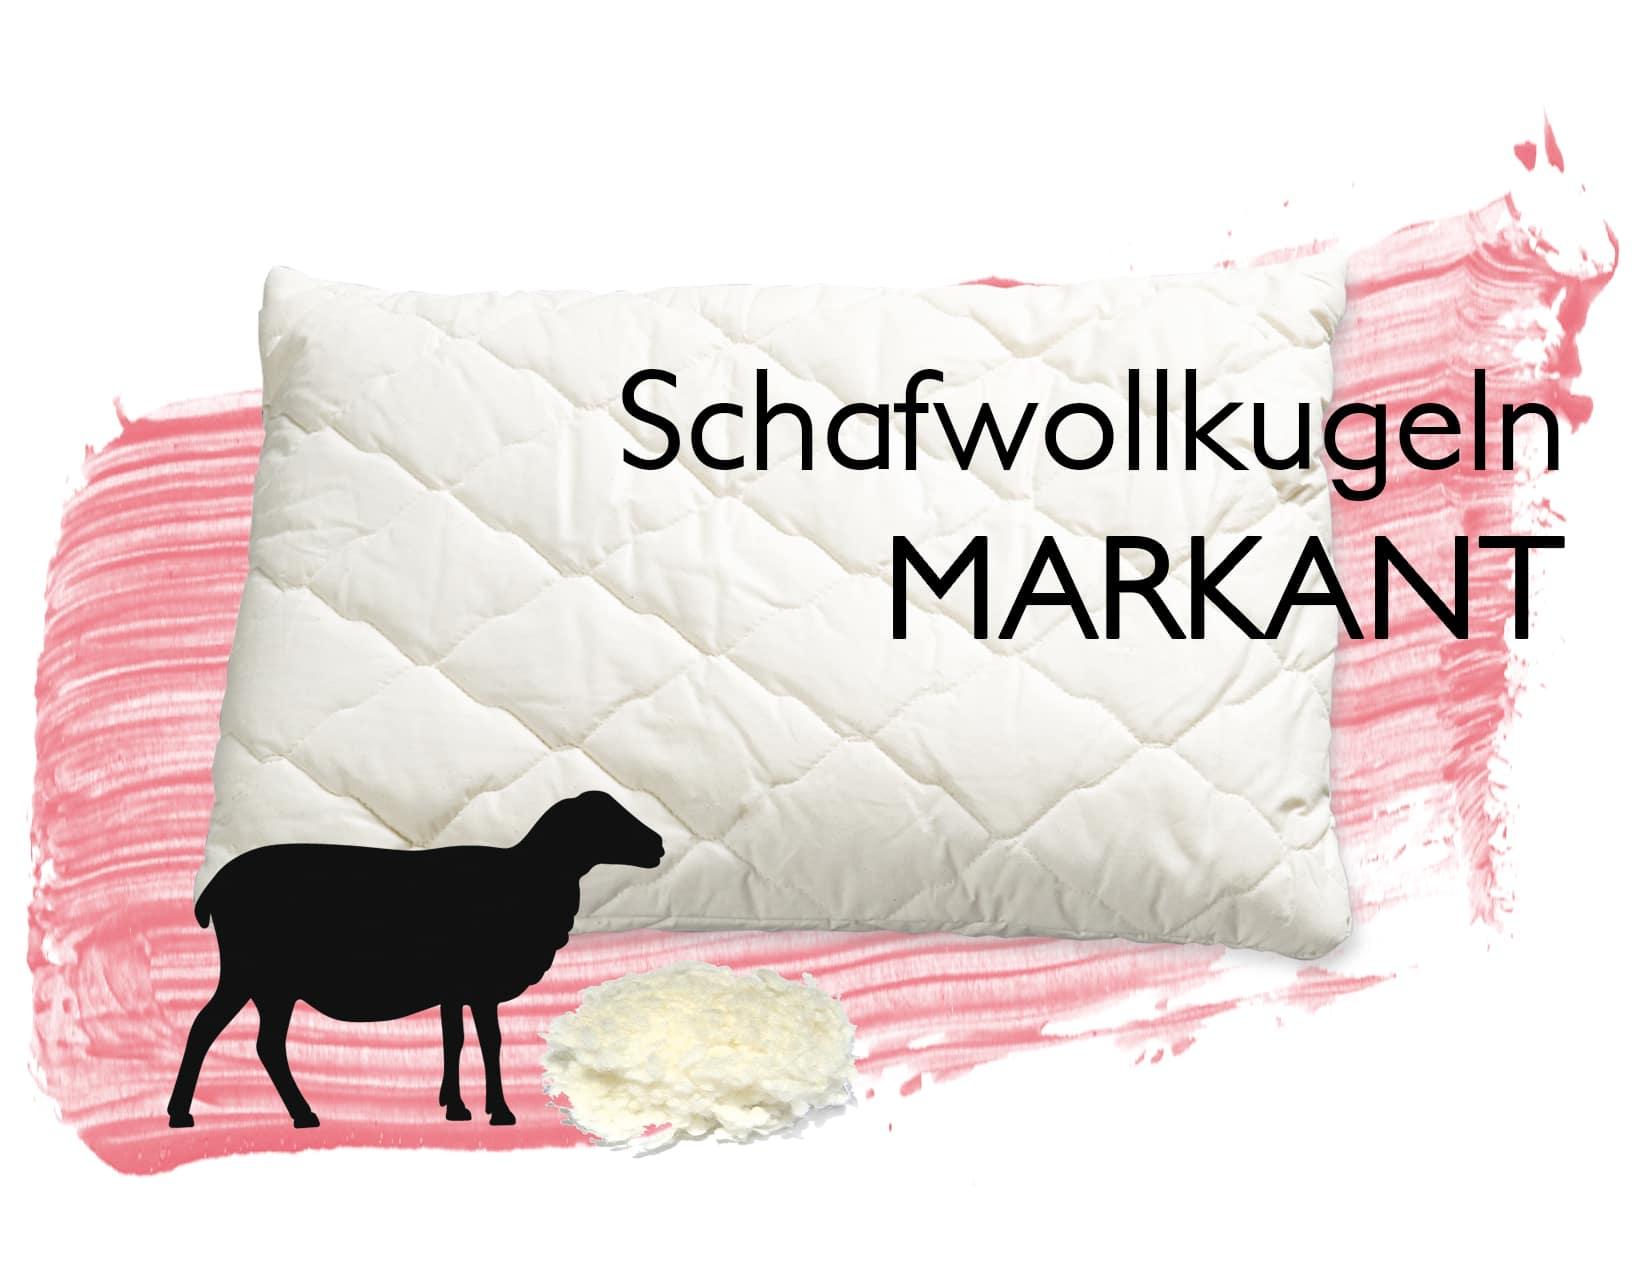 Markant Wolle Kissen Schwafwolle